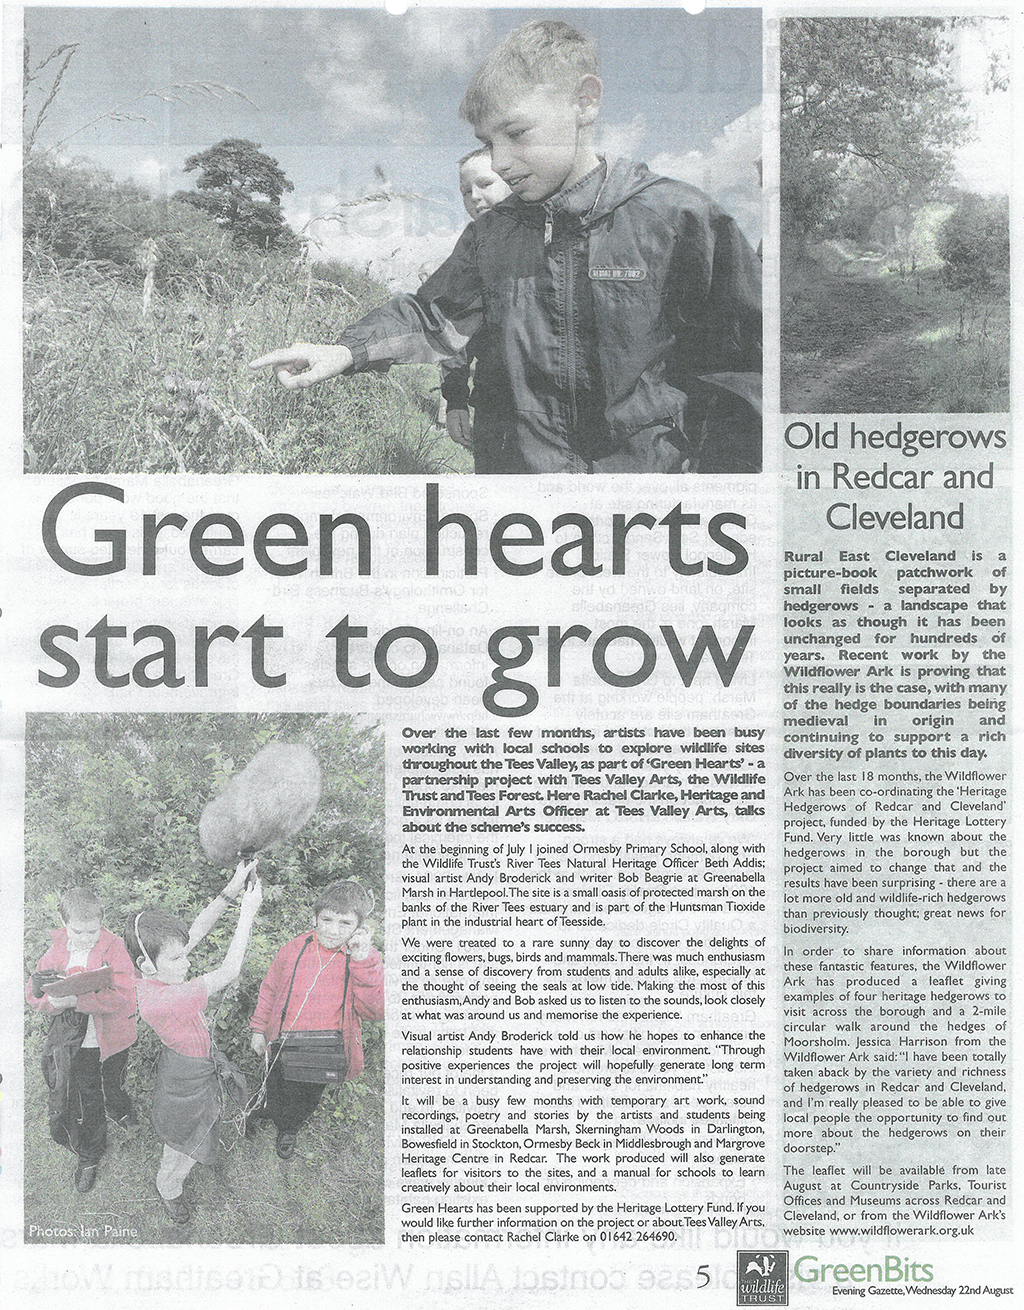 2007-08-22, evening gazette